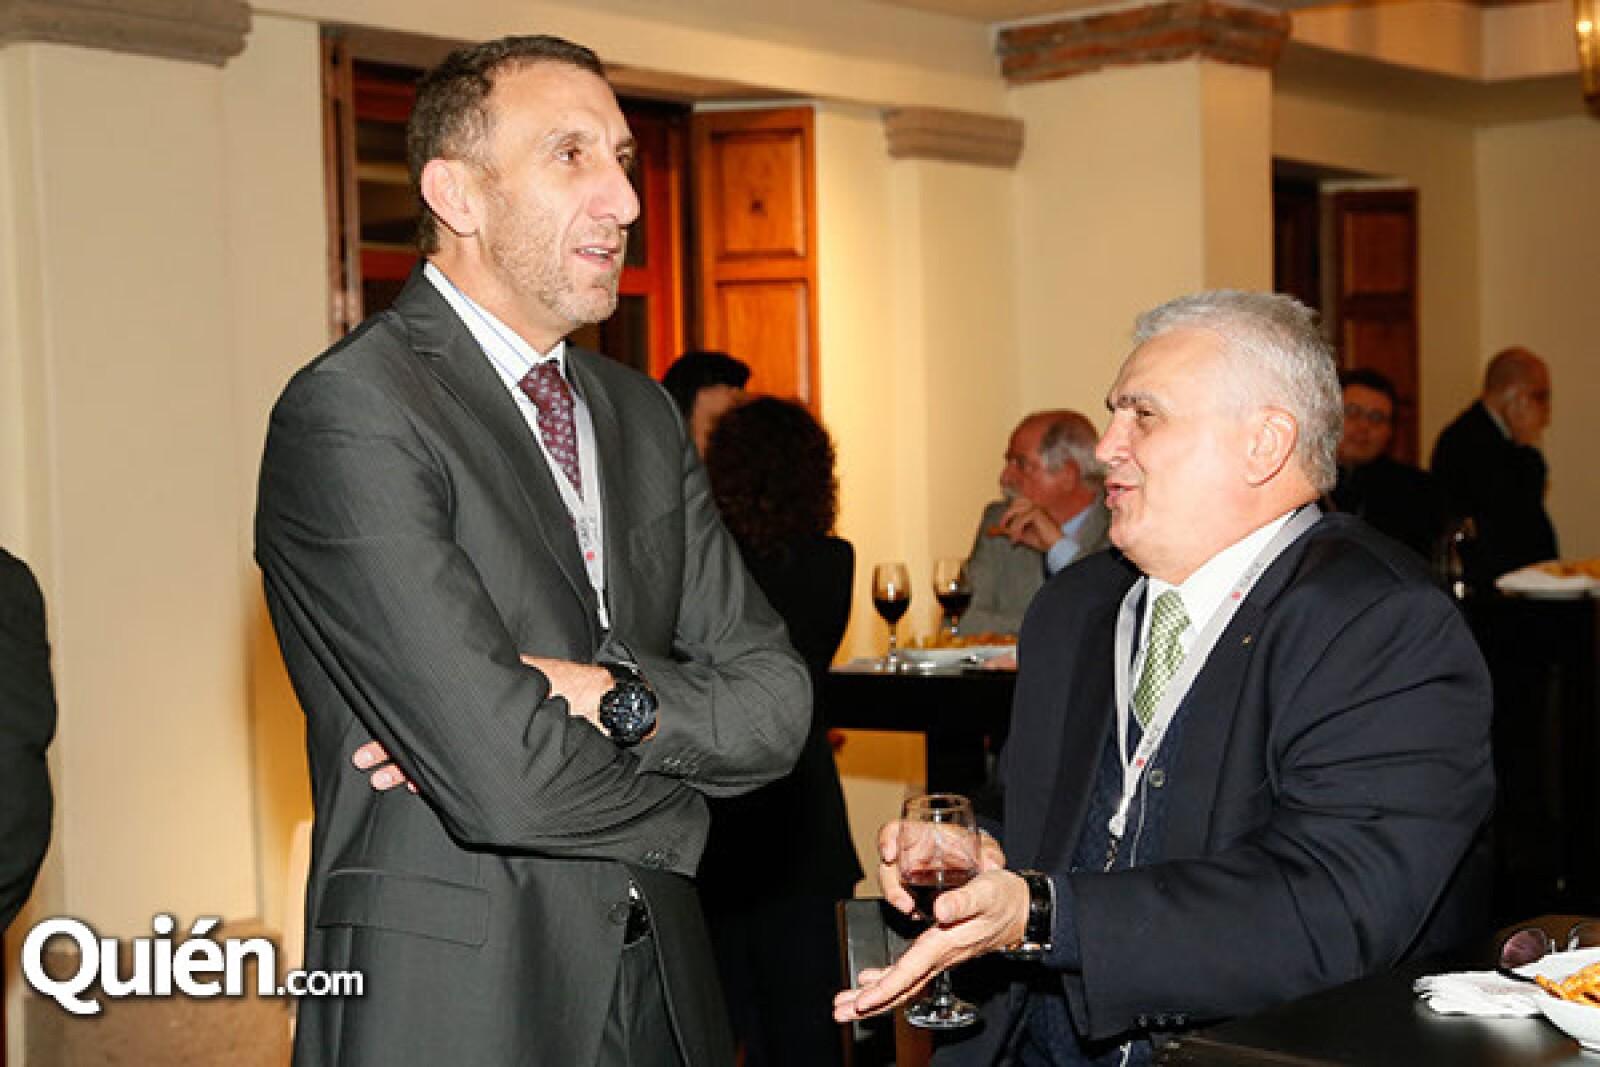 Marco Cannizzo y Vicenzo Delia